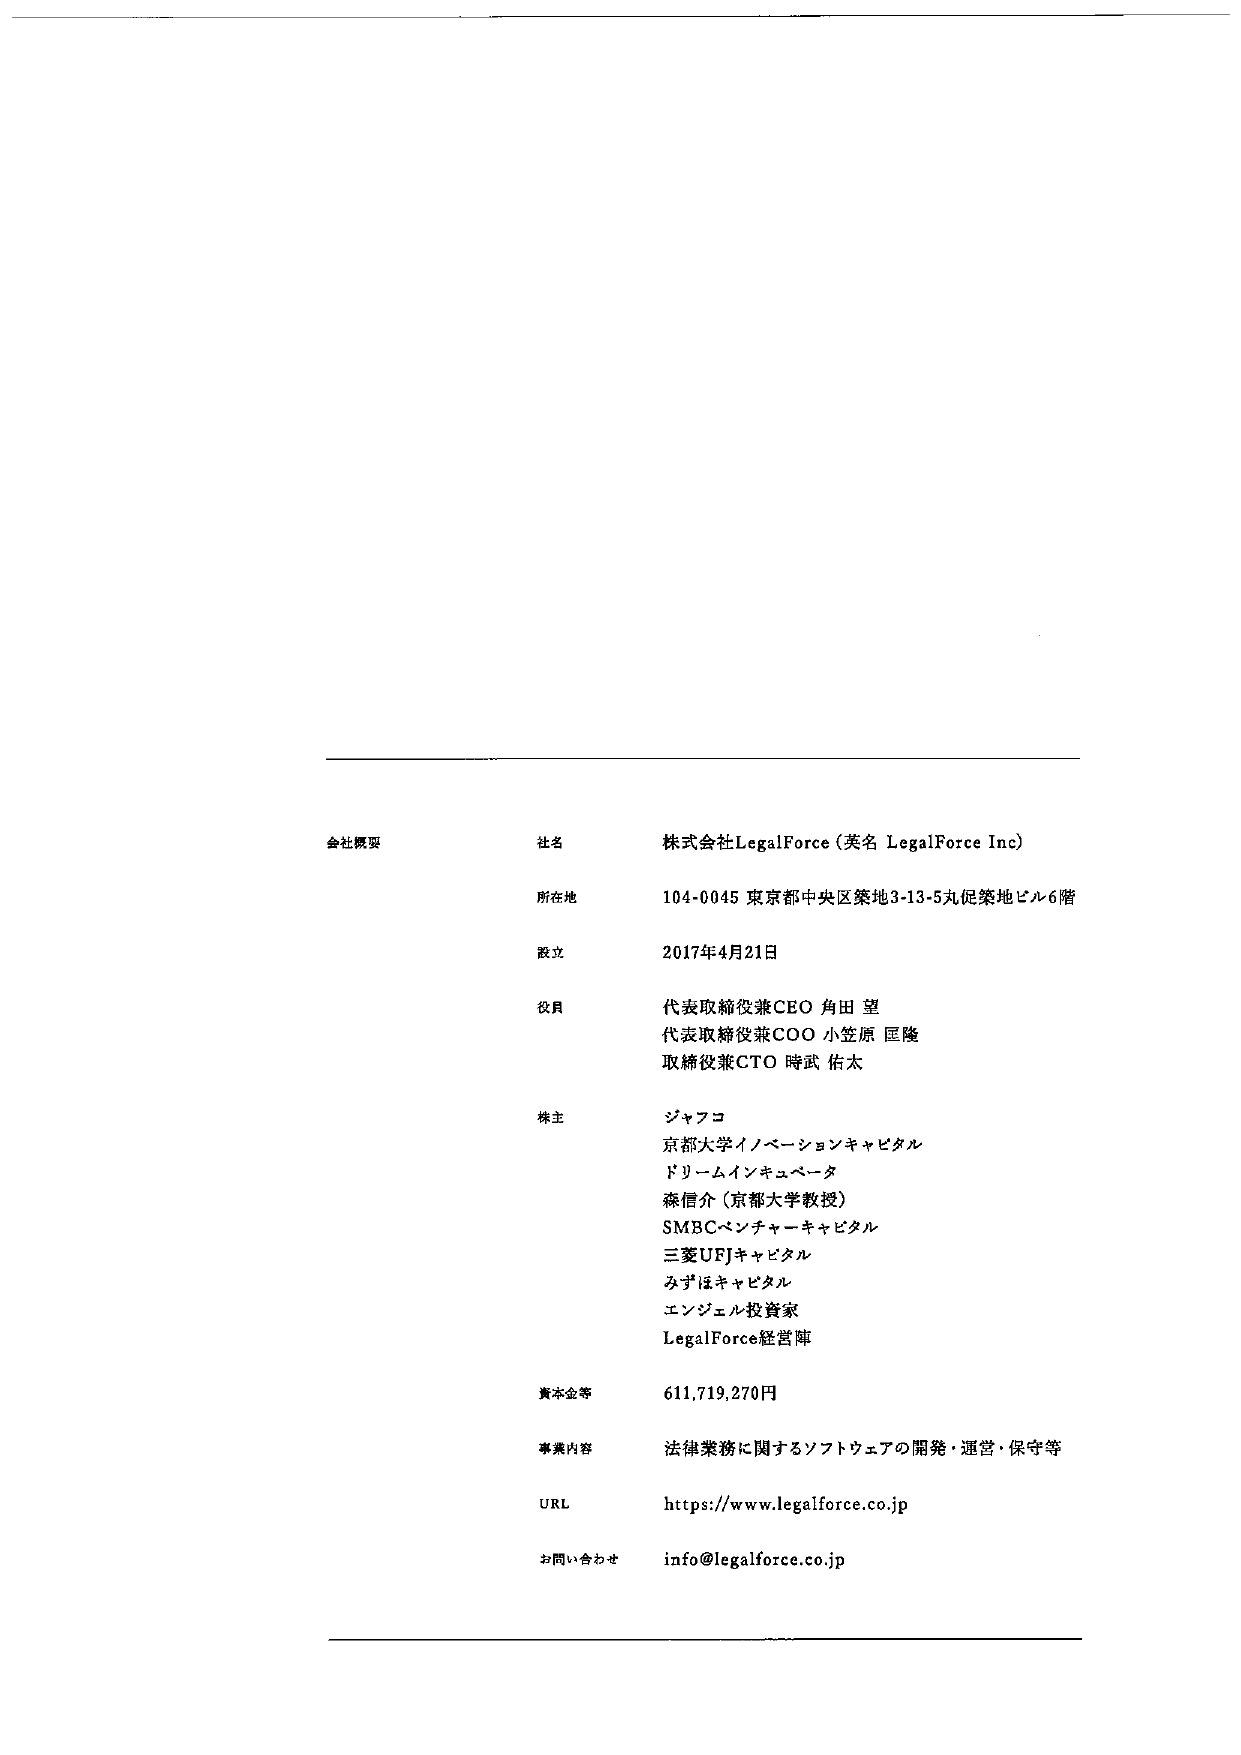 20190404155650_page-0012.jpg